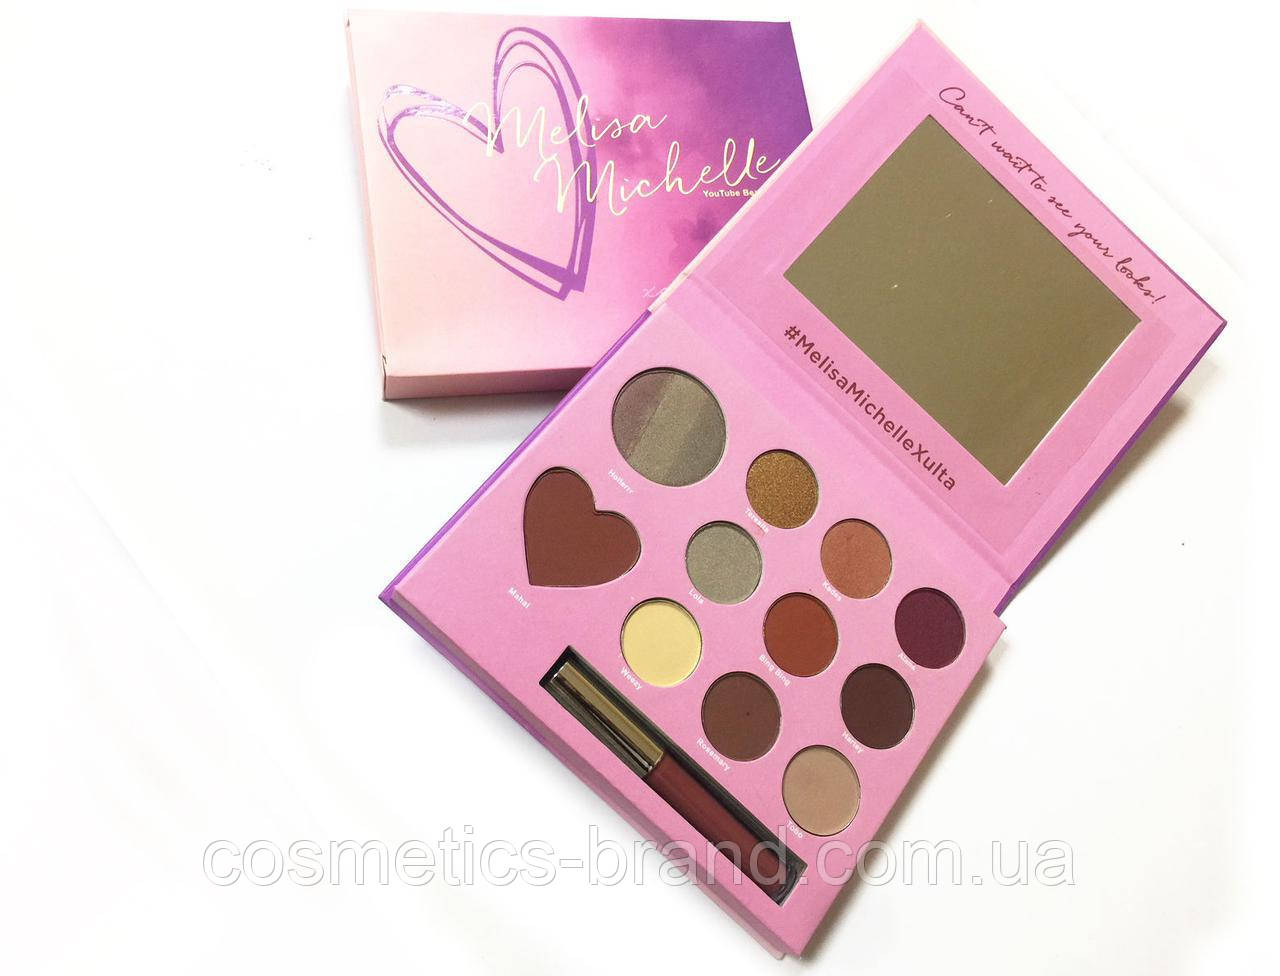 Палетка для макияжа Melisa Michelle Makeup Palette (реплика)